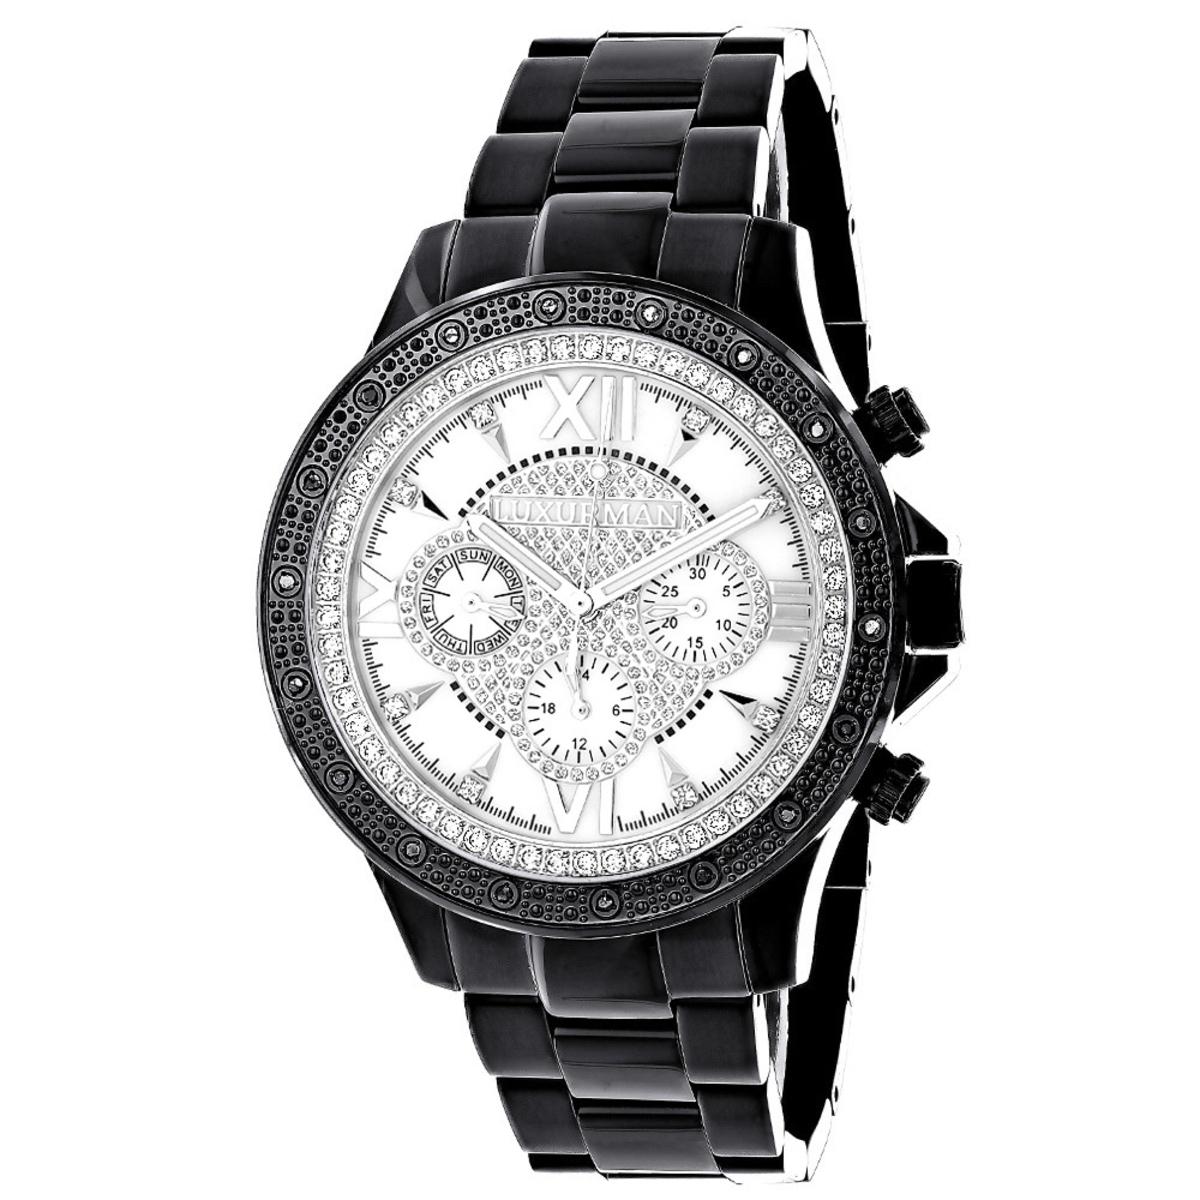 Luxurman Watches: Liberty Mens Real Diamond Watch 0.2ct Black